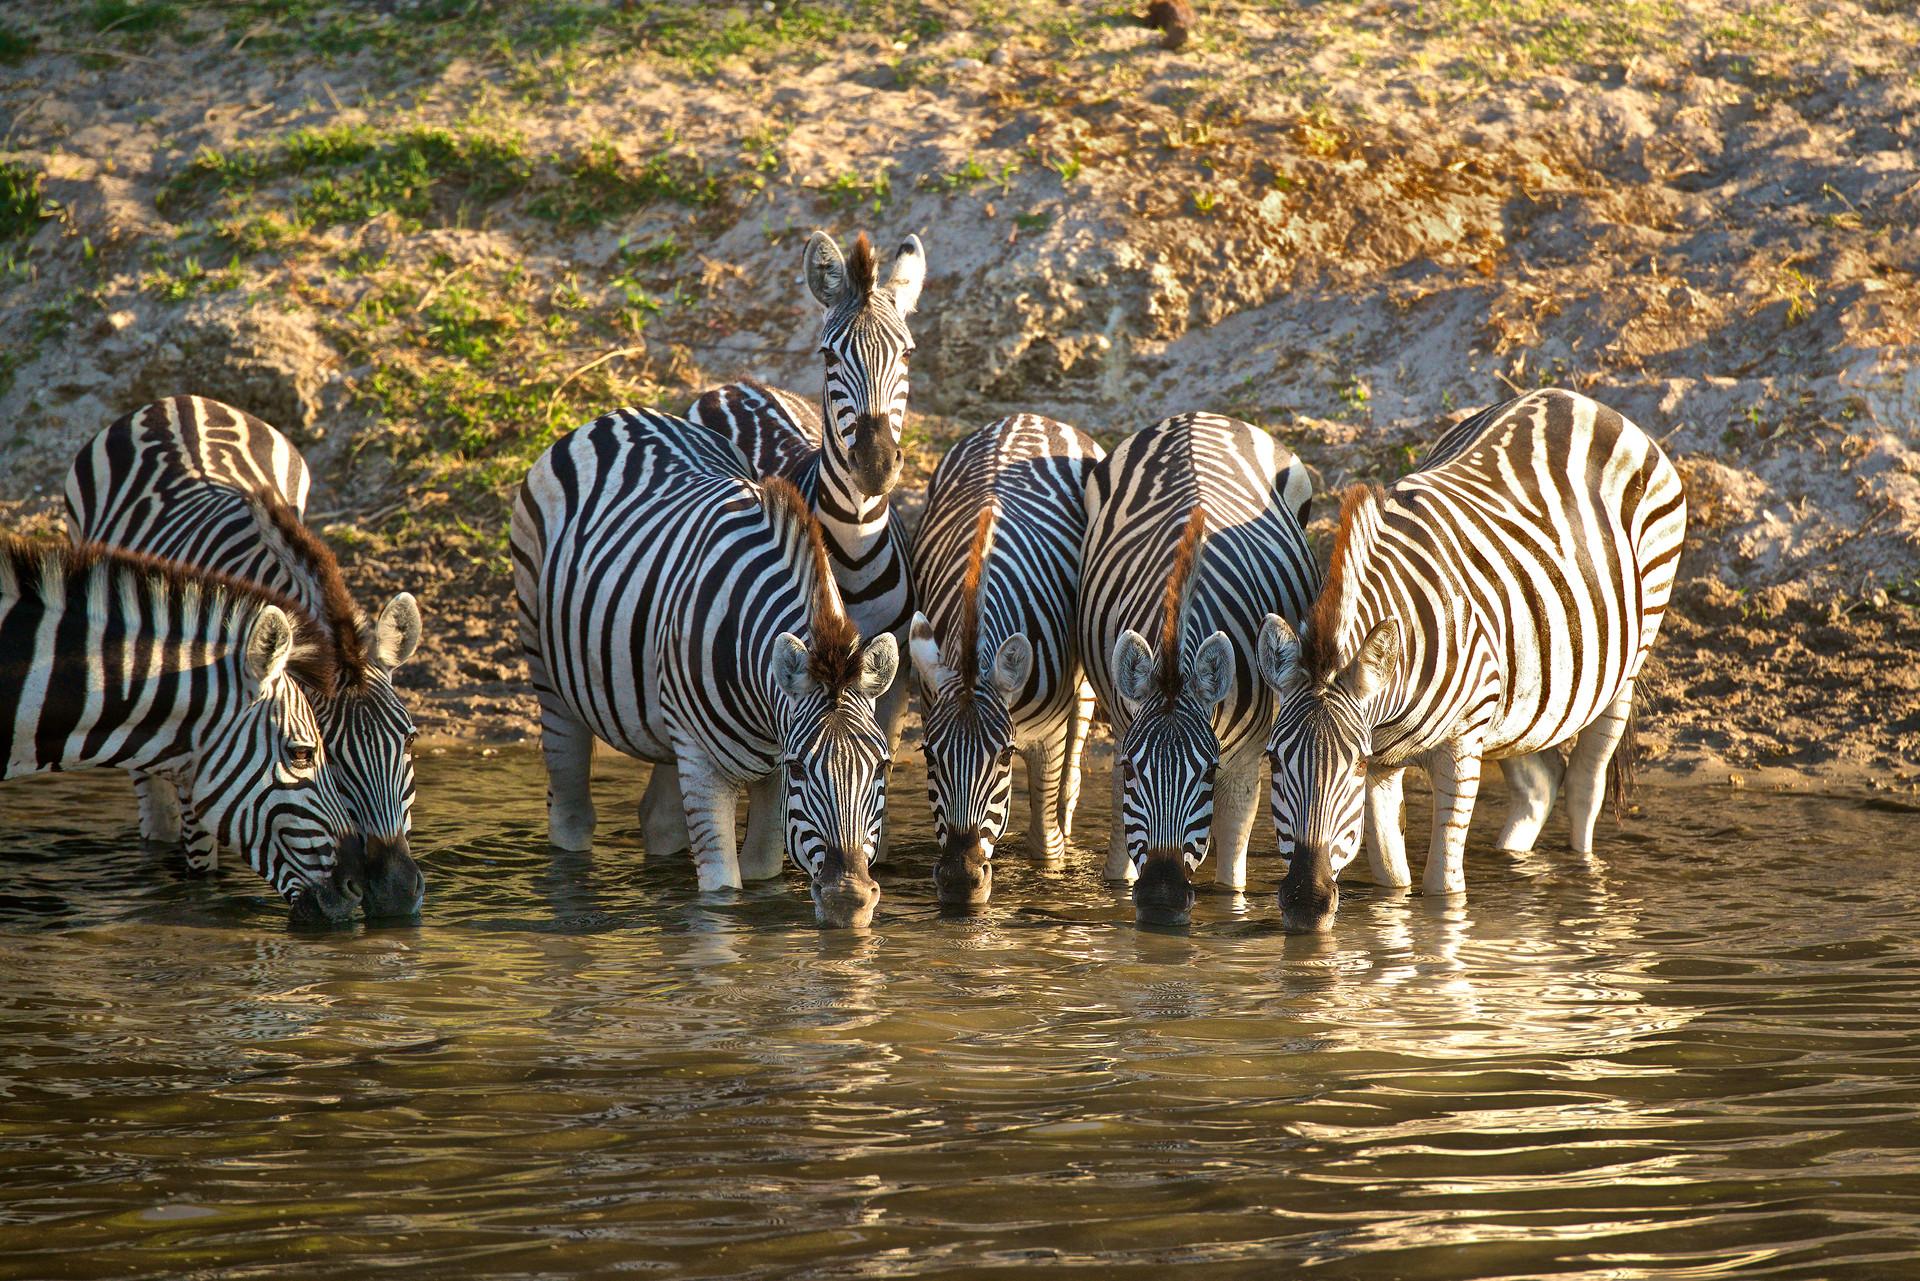 Zebrasdrinking2.jpg